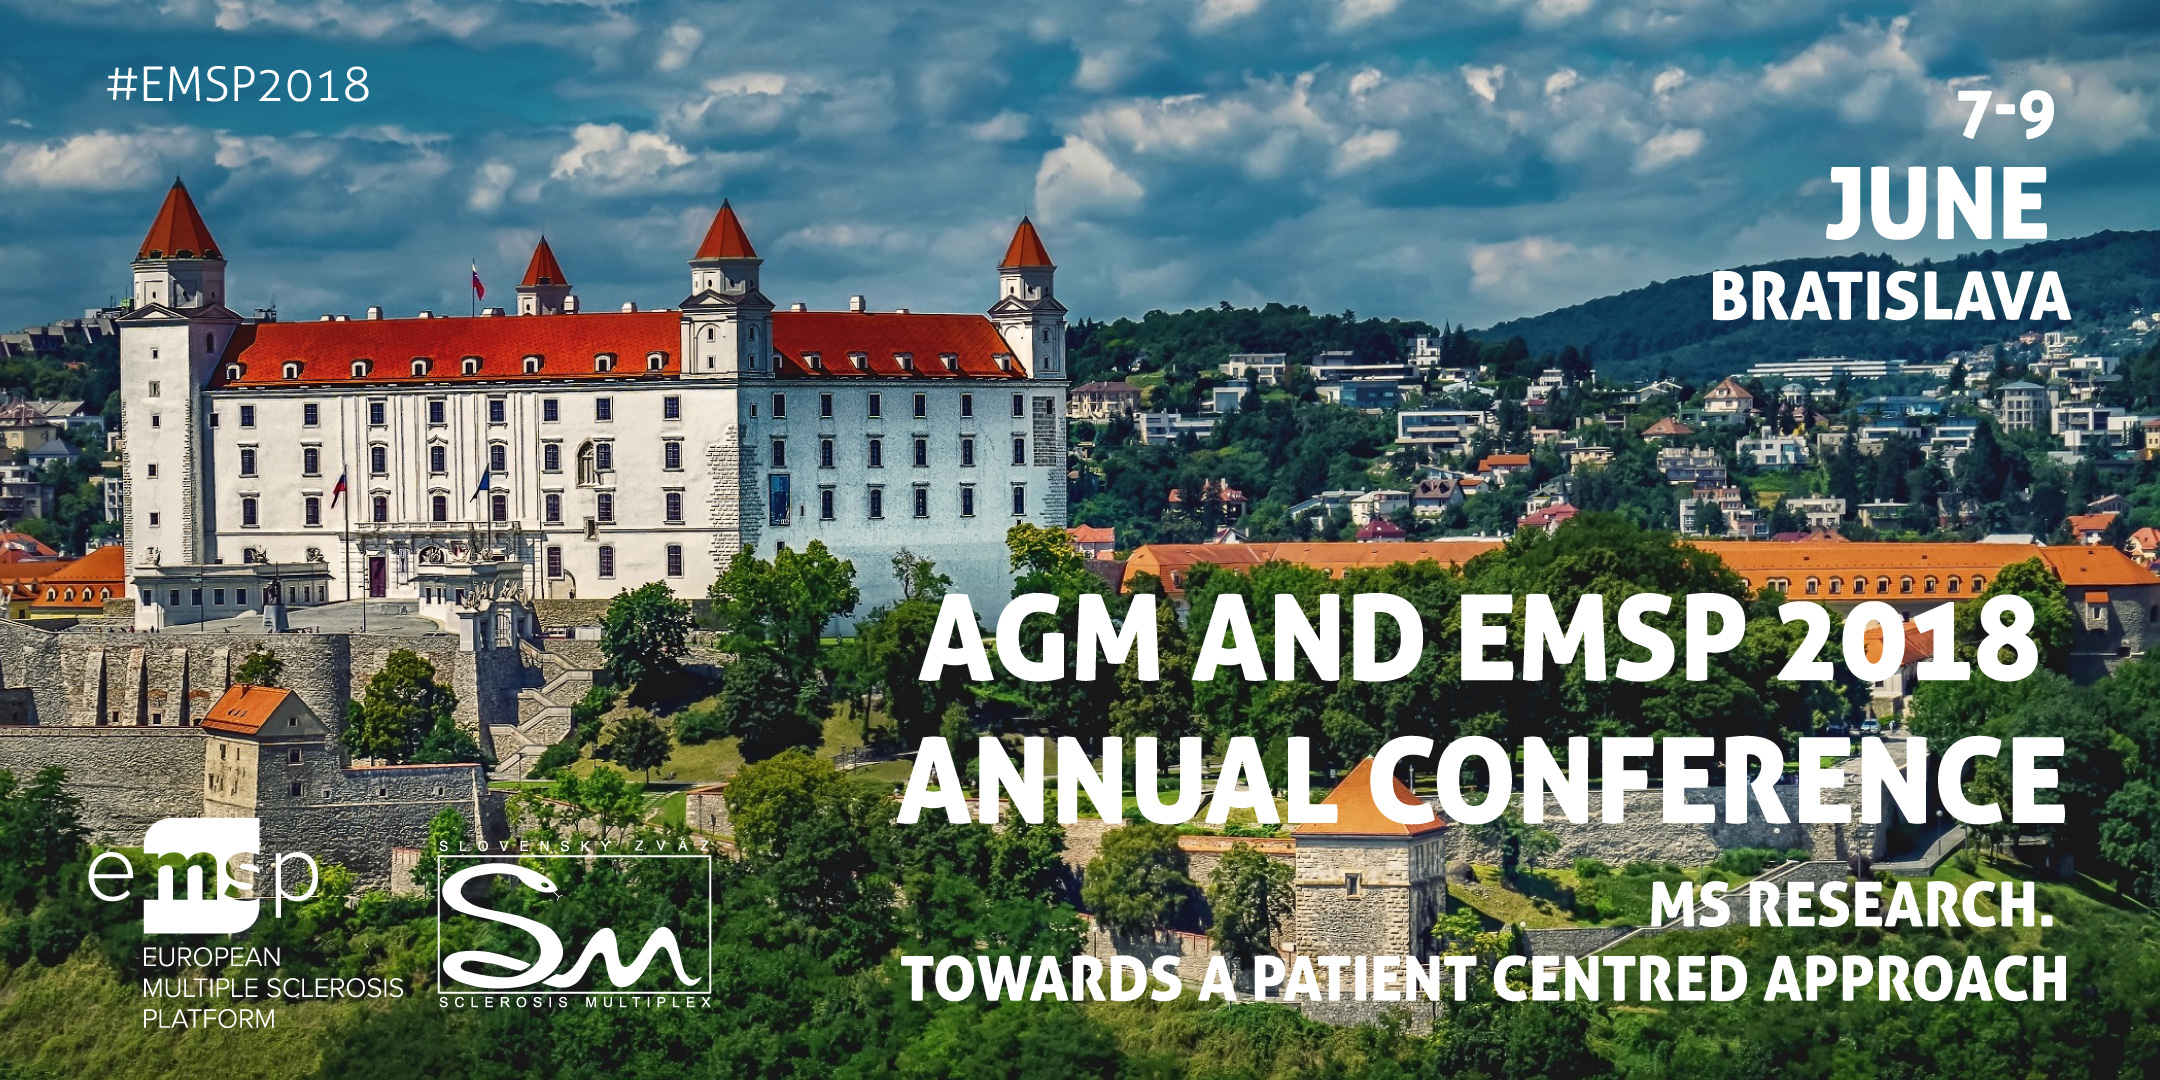 EMSP 2018 Annual Conference: June 7-9, Bratislava, Slovakia | EMSP ...